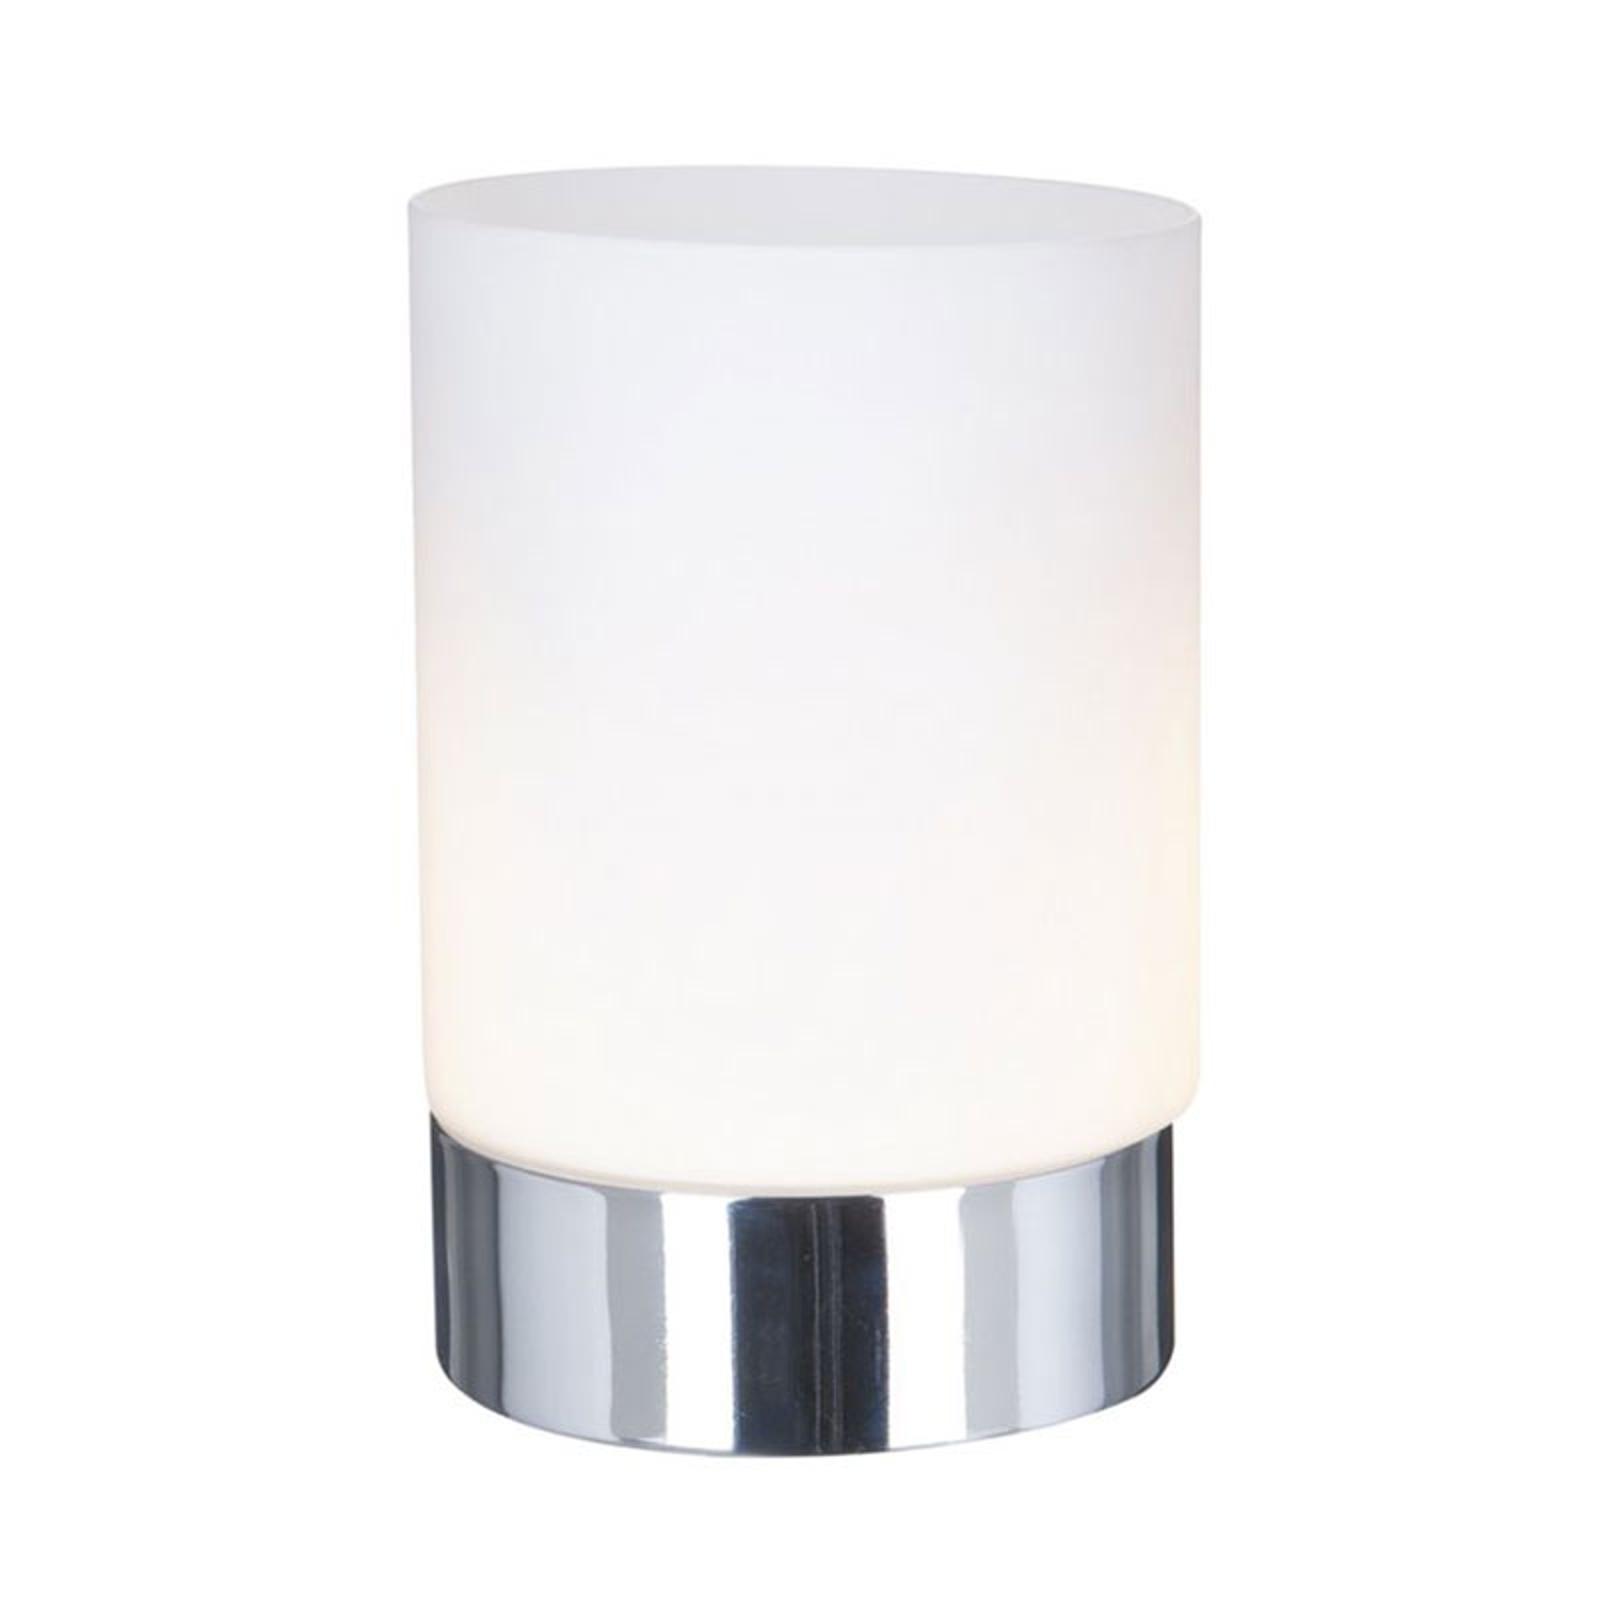 Tafellamp touch 9791 met glascilinder